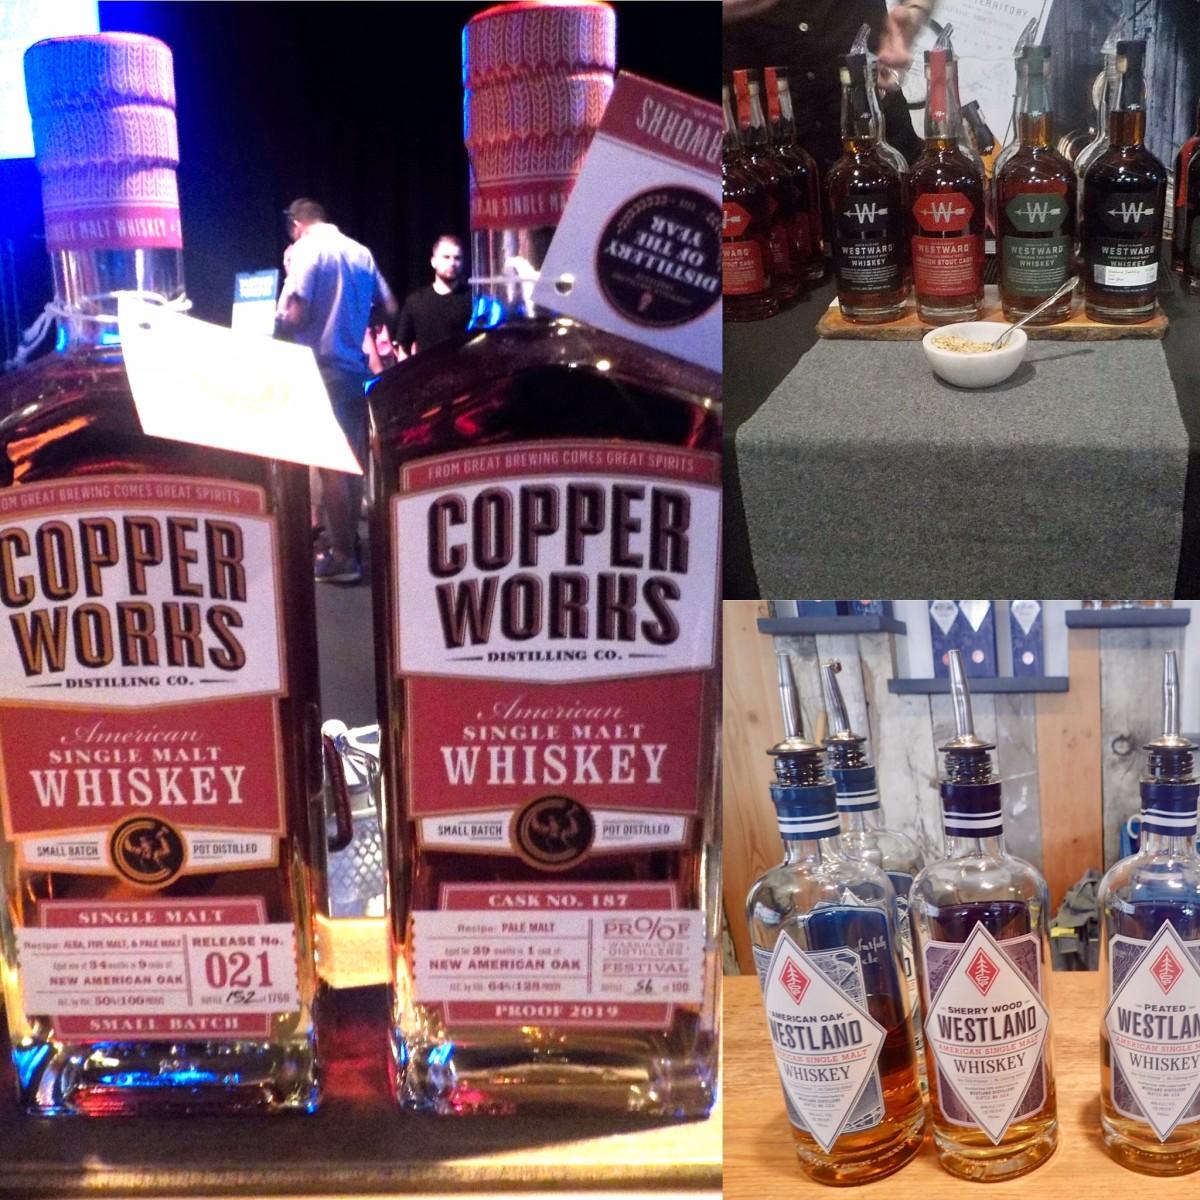 (L to R) Copperworks Distilling (Proof 2019), Westward Whiskey (Oregon Distilled 2020), Westland Distillery